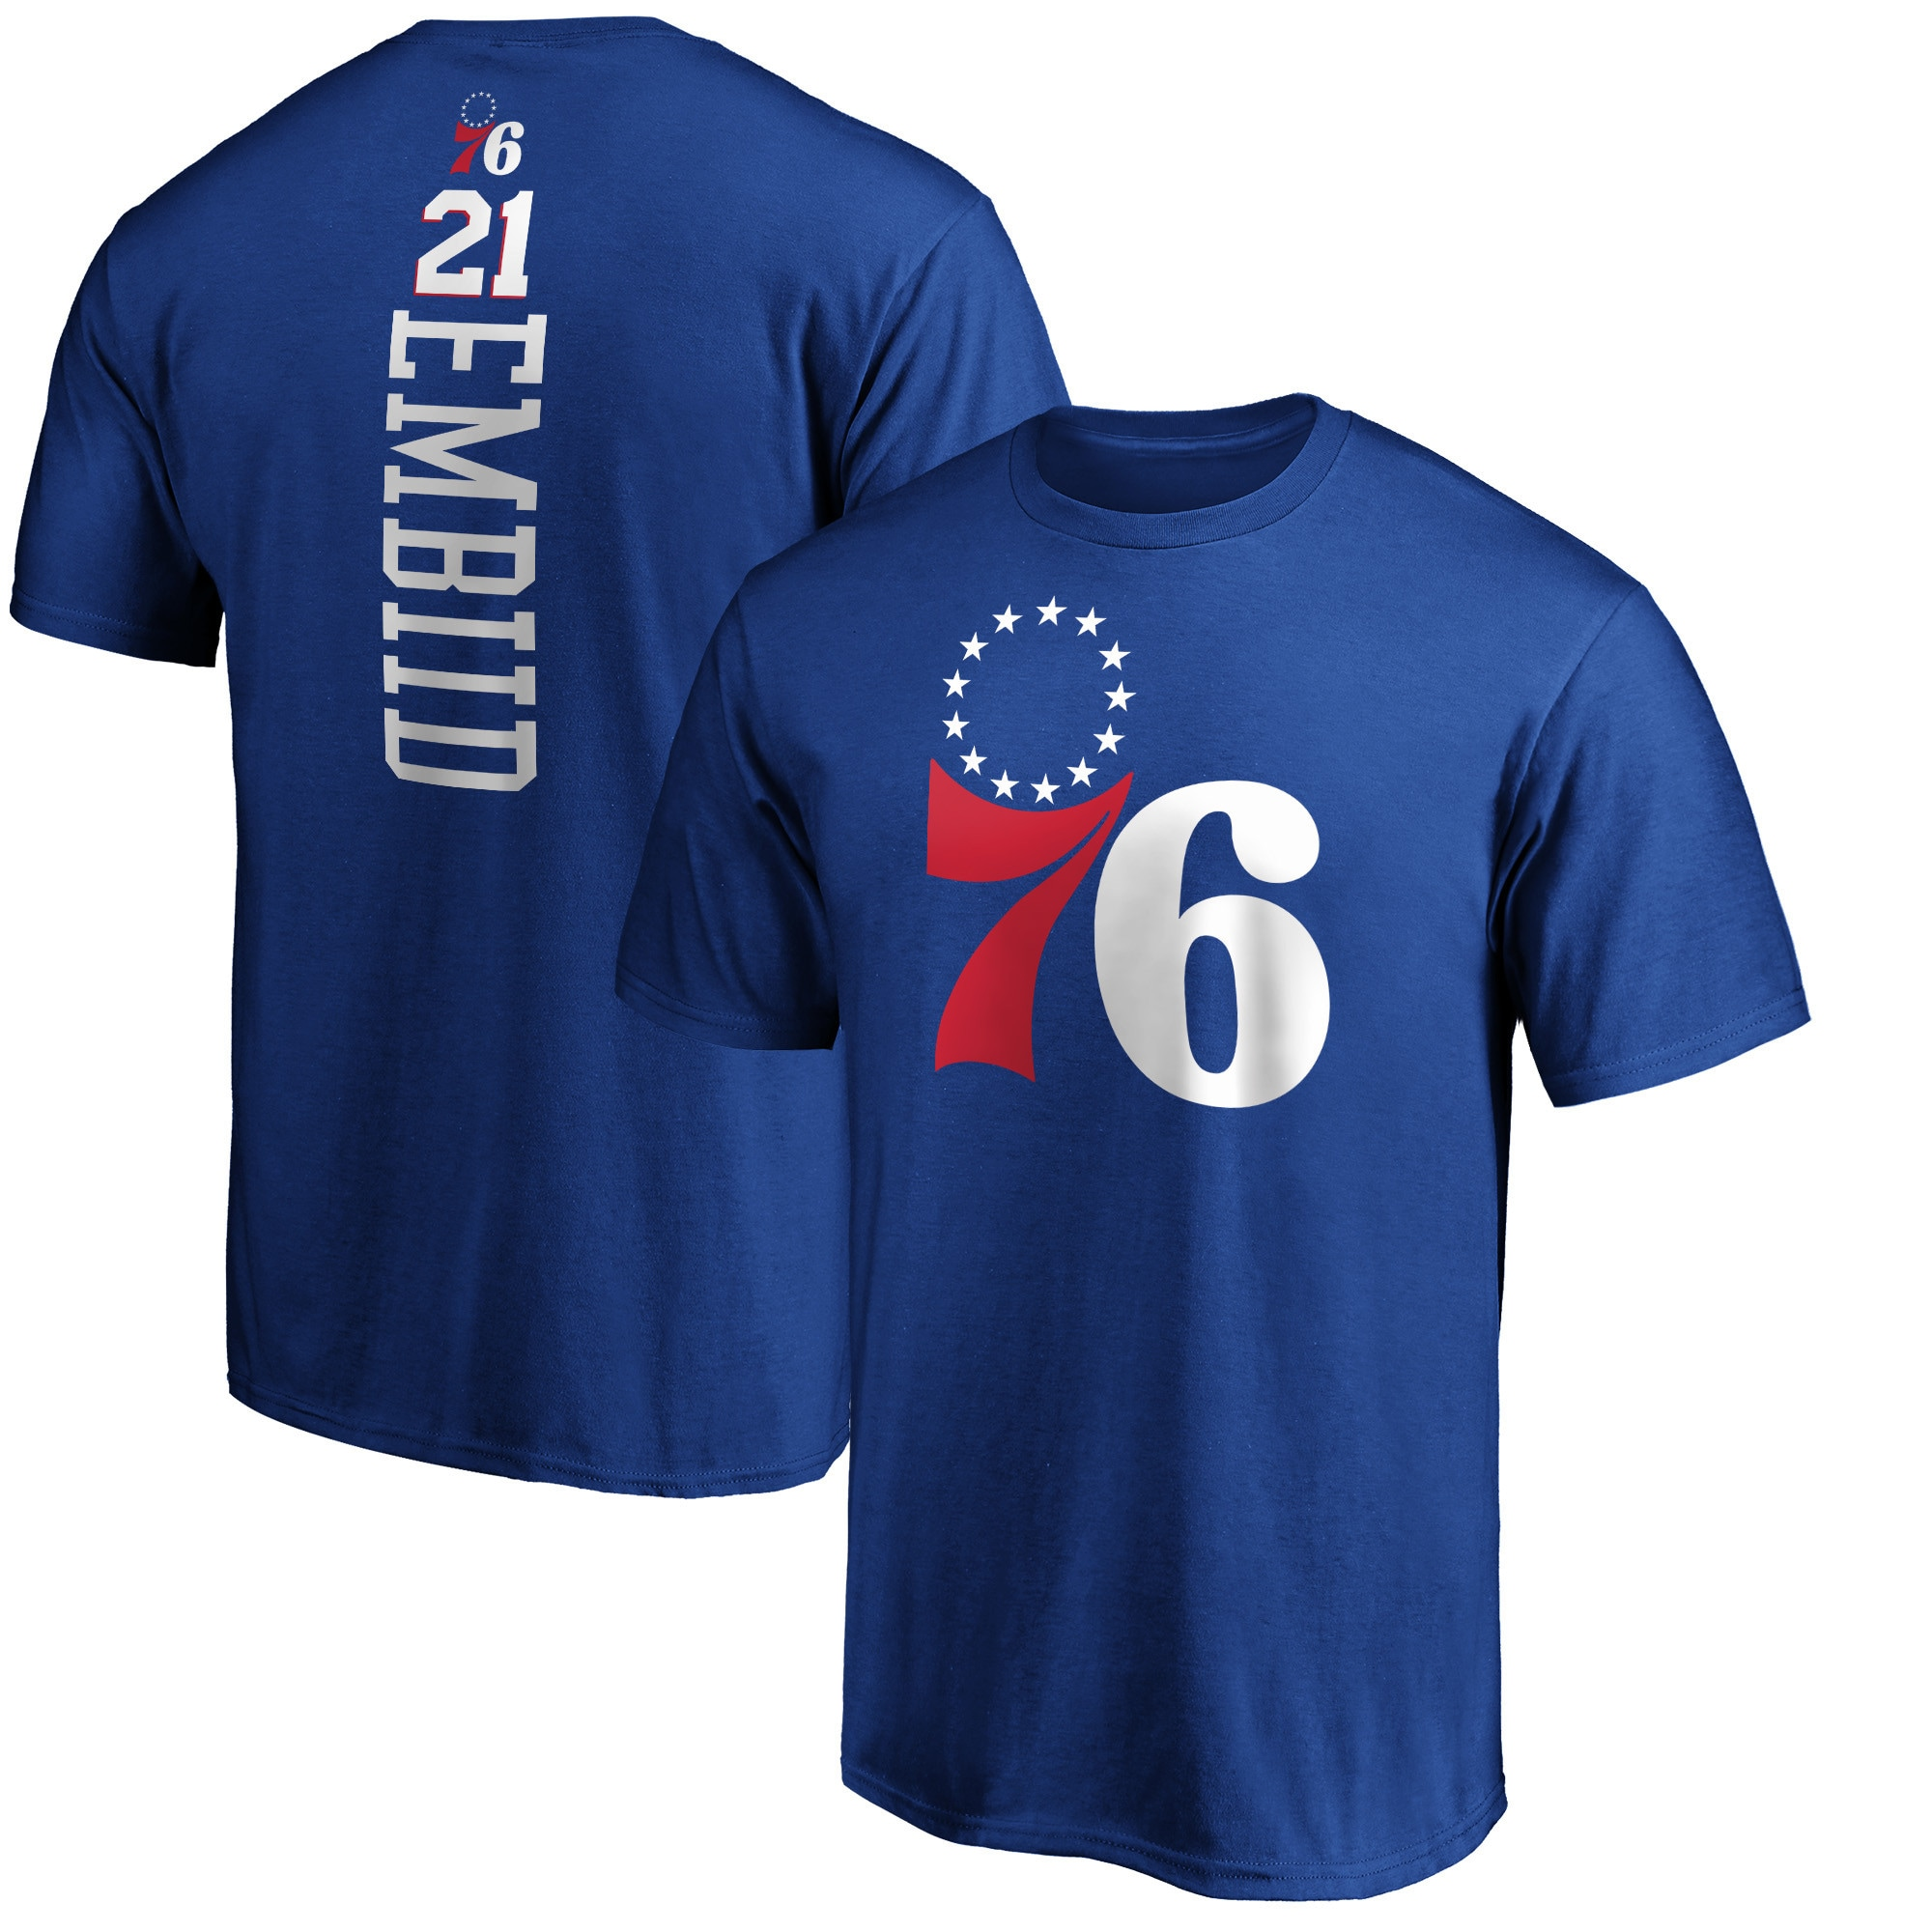 Joel Embiid Philadelphia 76ers Fanatics Branded Playmaker Name & Number T-Shirt - Royal